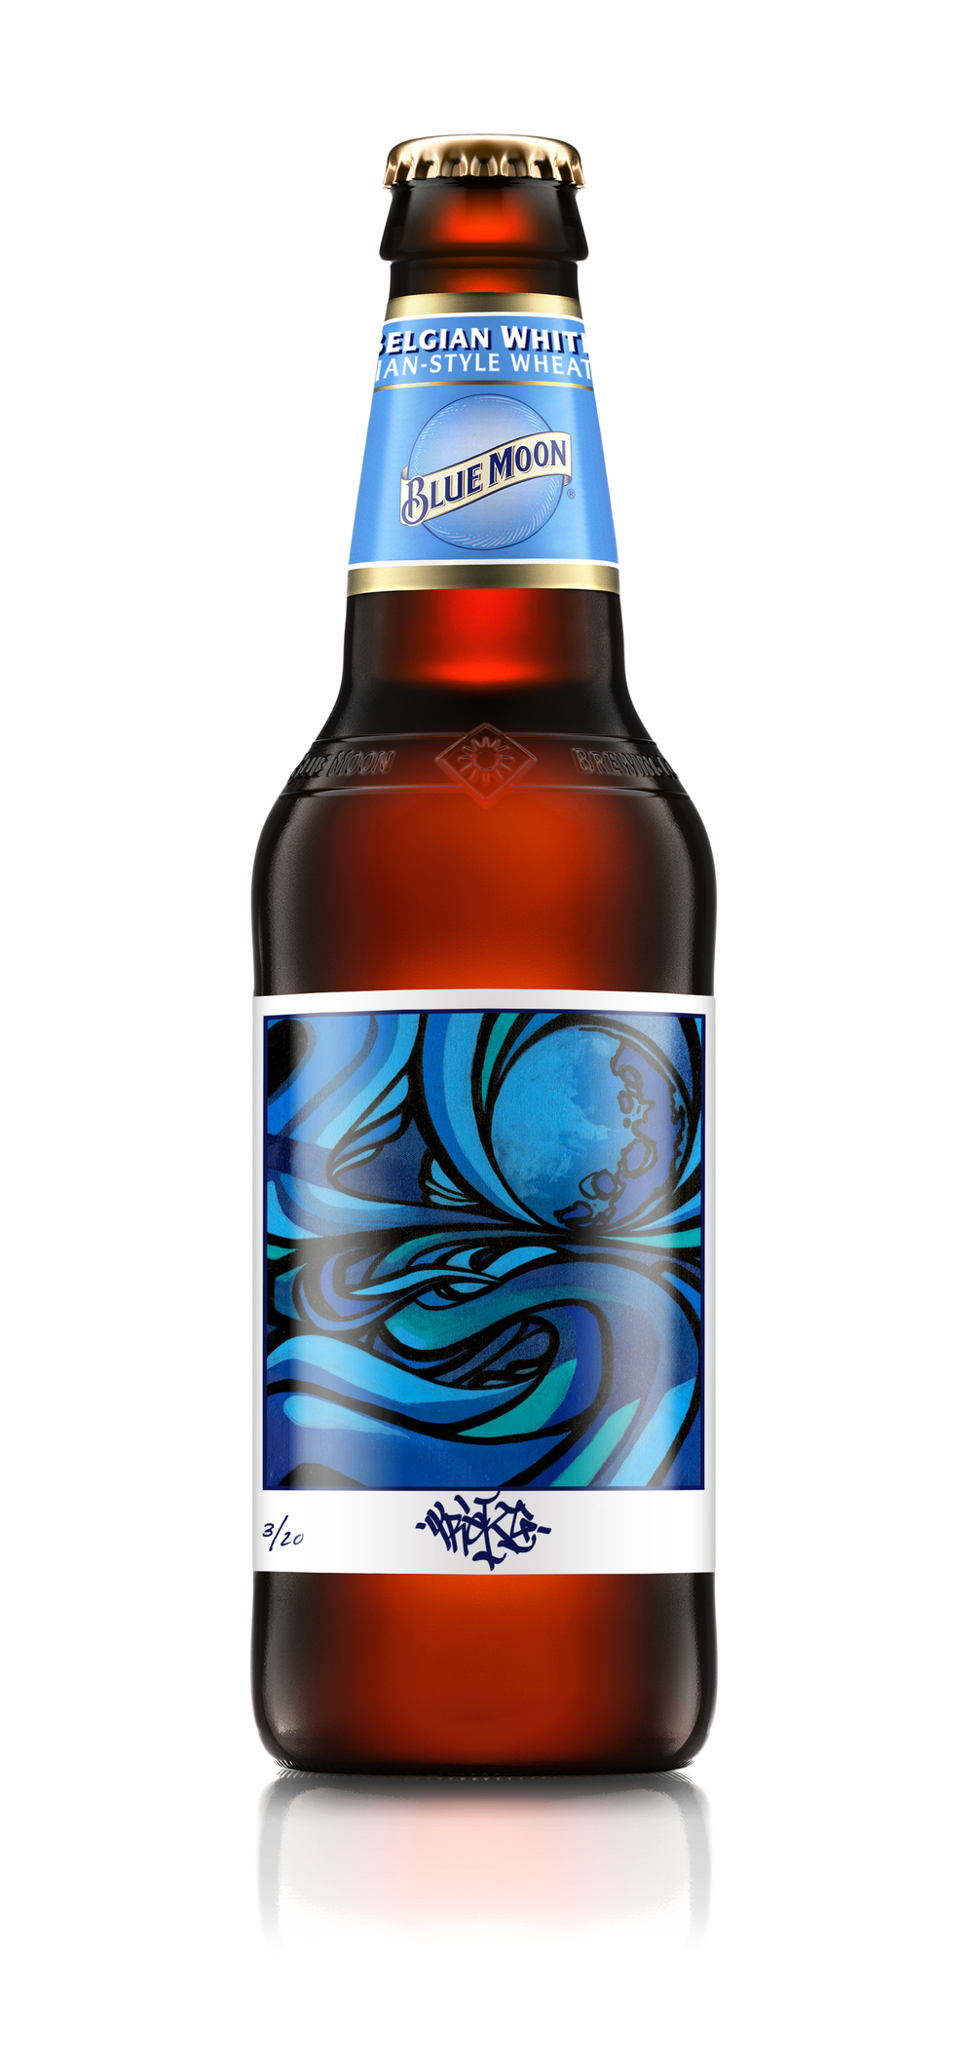 BMO-195A_Bottle_12z_Render_OscarMontes_150401_FJ.jpg